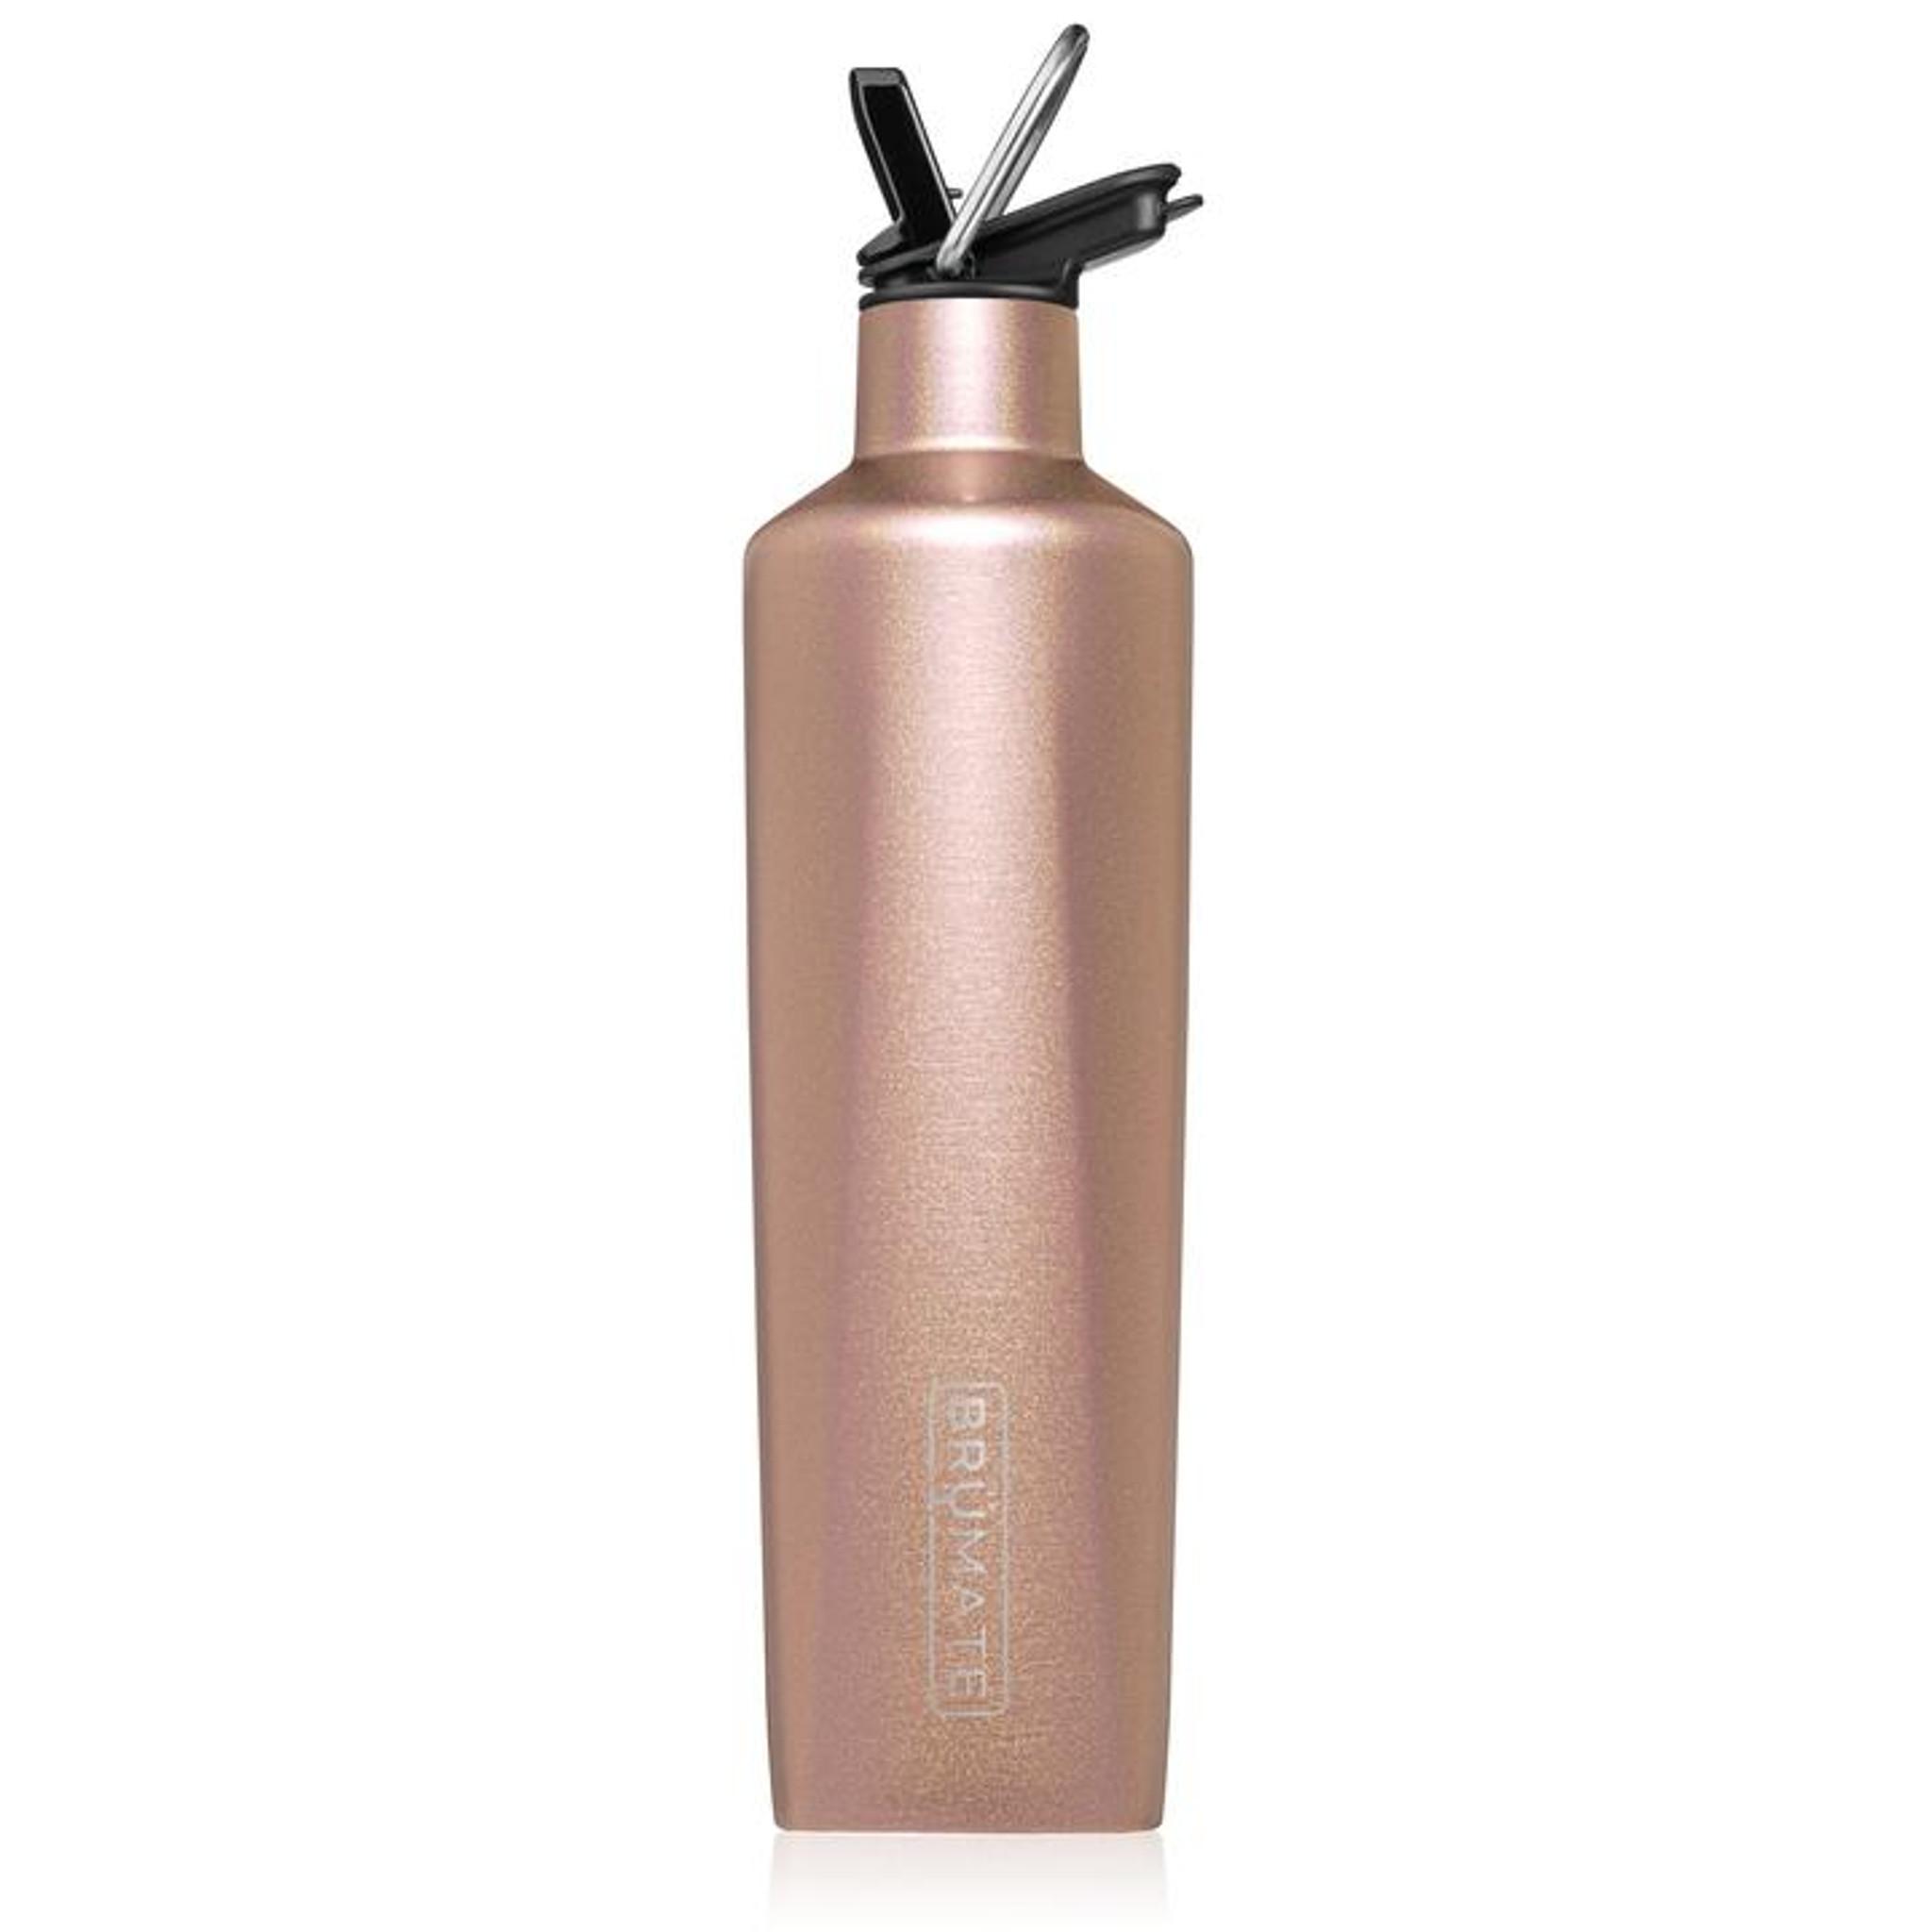 Brumate Rehydration Bottle - Glitter Rose Gold